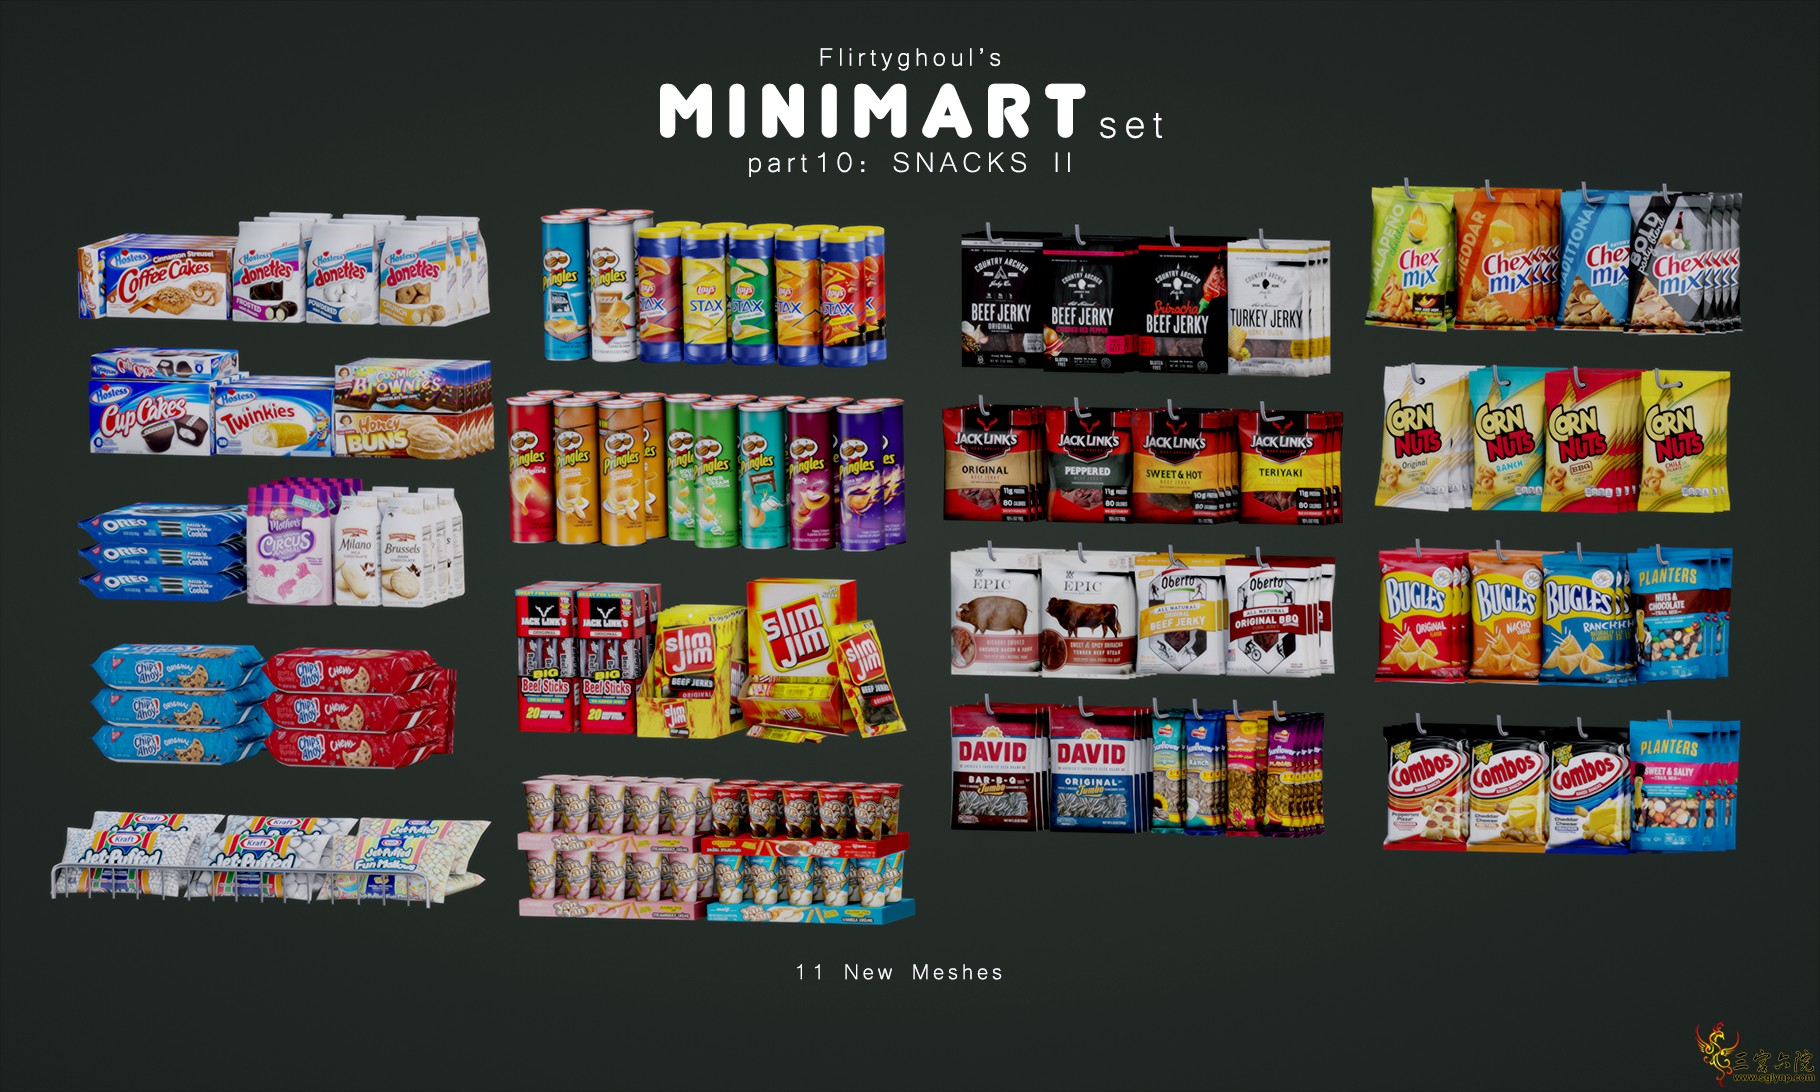 FG_MinimartSet_SNACKS2PREV2.PNG